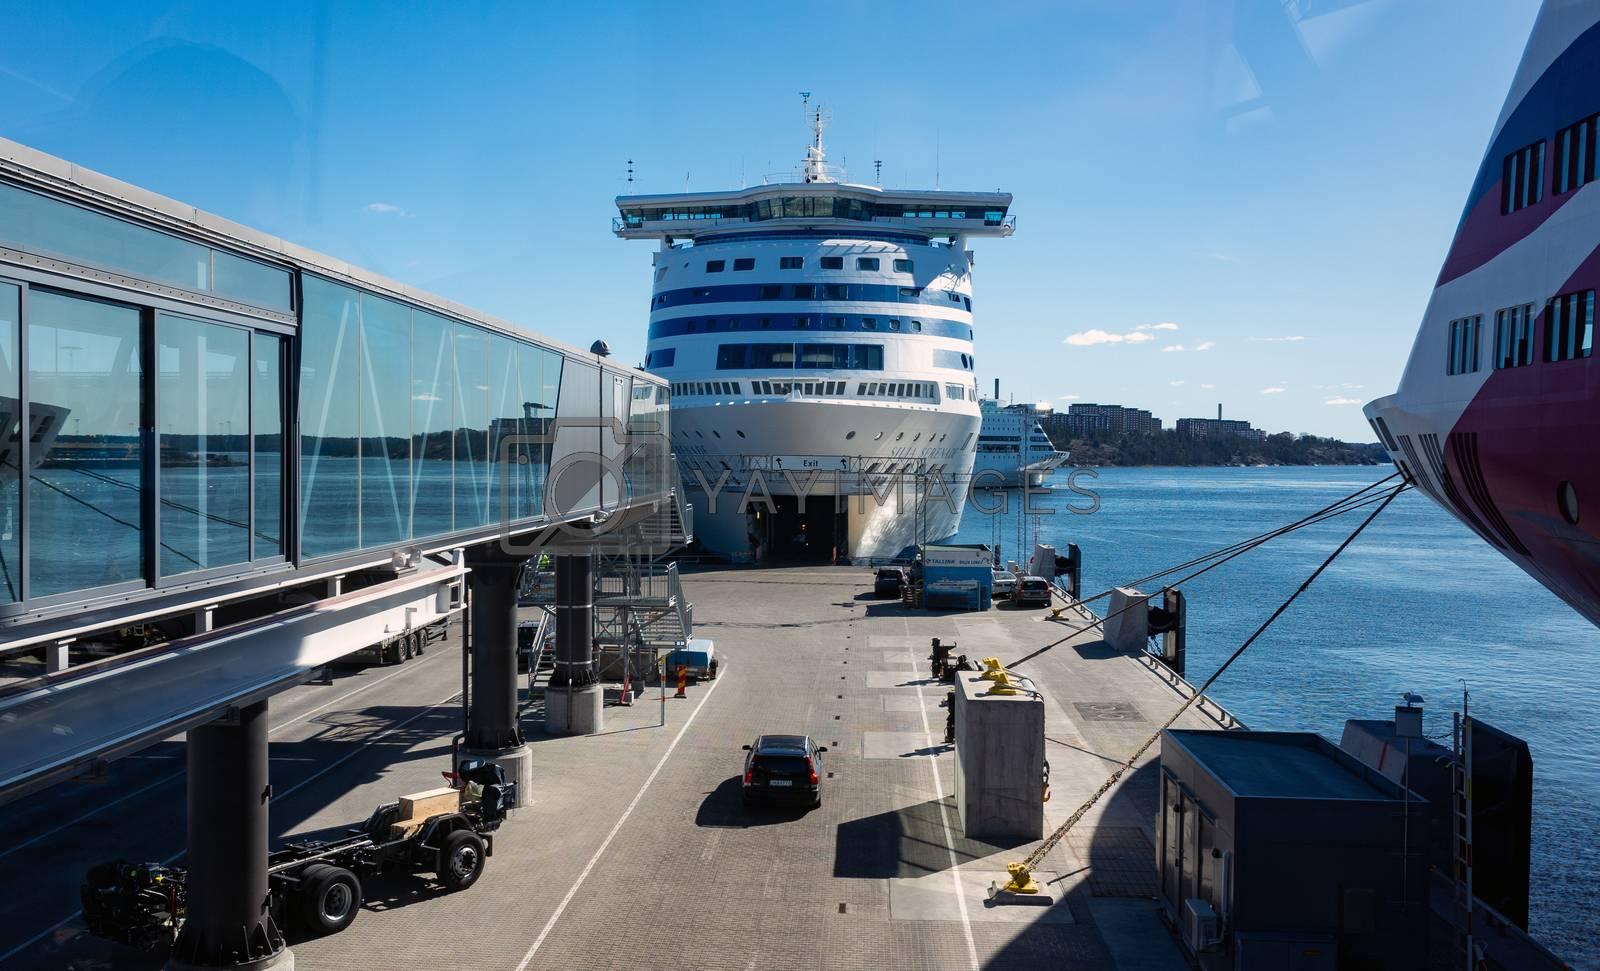 22 April 2019, Stockholm, Sweden. High-speed passenger and car ferry of the Estonian shipping concern Tallink Silja Europa in the port Vartahamnen in Stockholm.